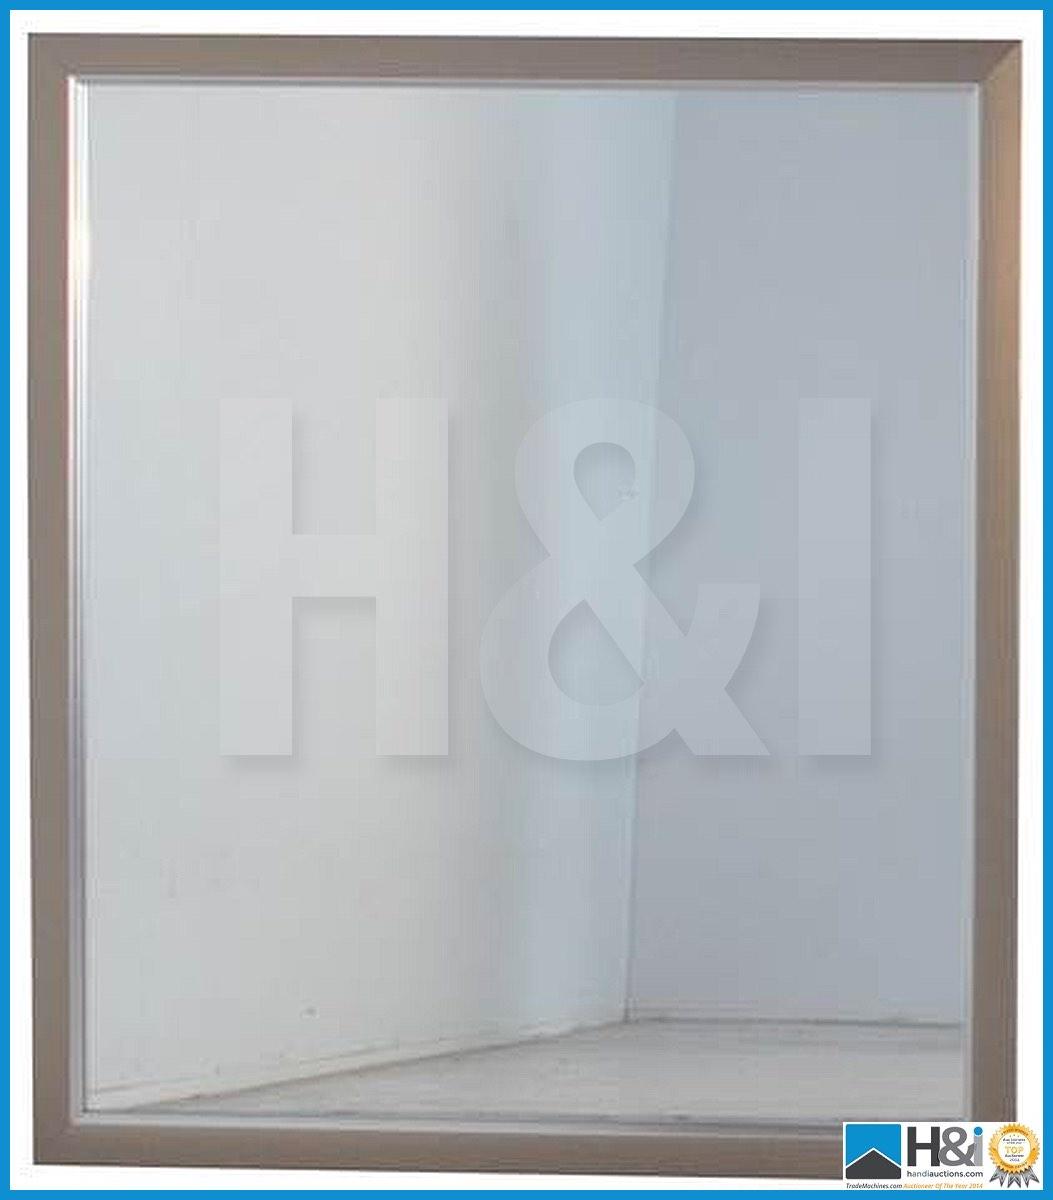 Lot 26 - Stunning black walnut bedroom furniture set comprising: 2-door wardrobe - H 193cm x W 110cm